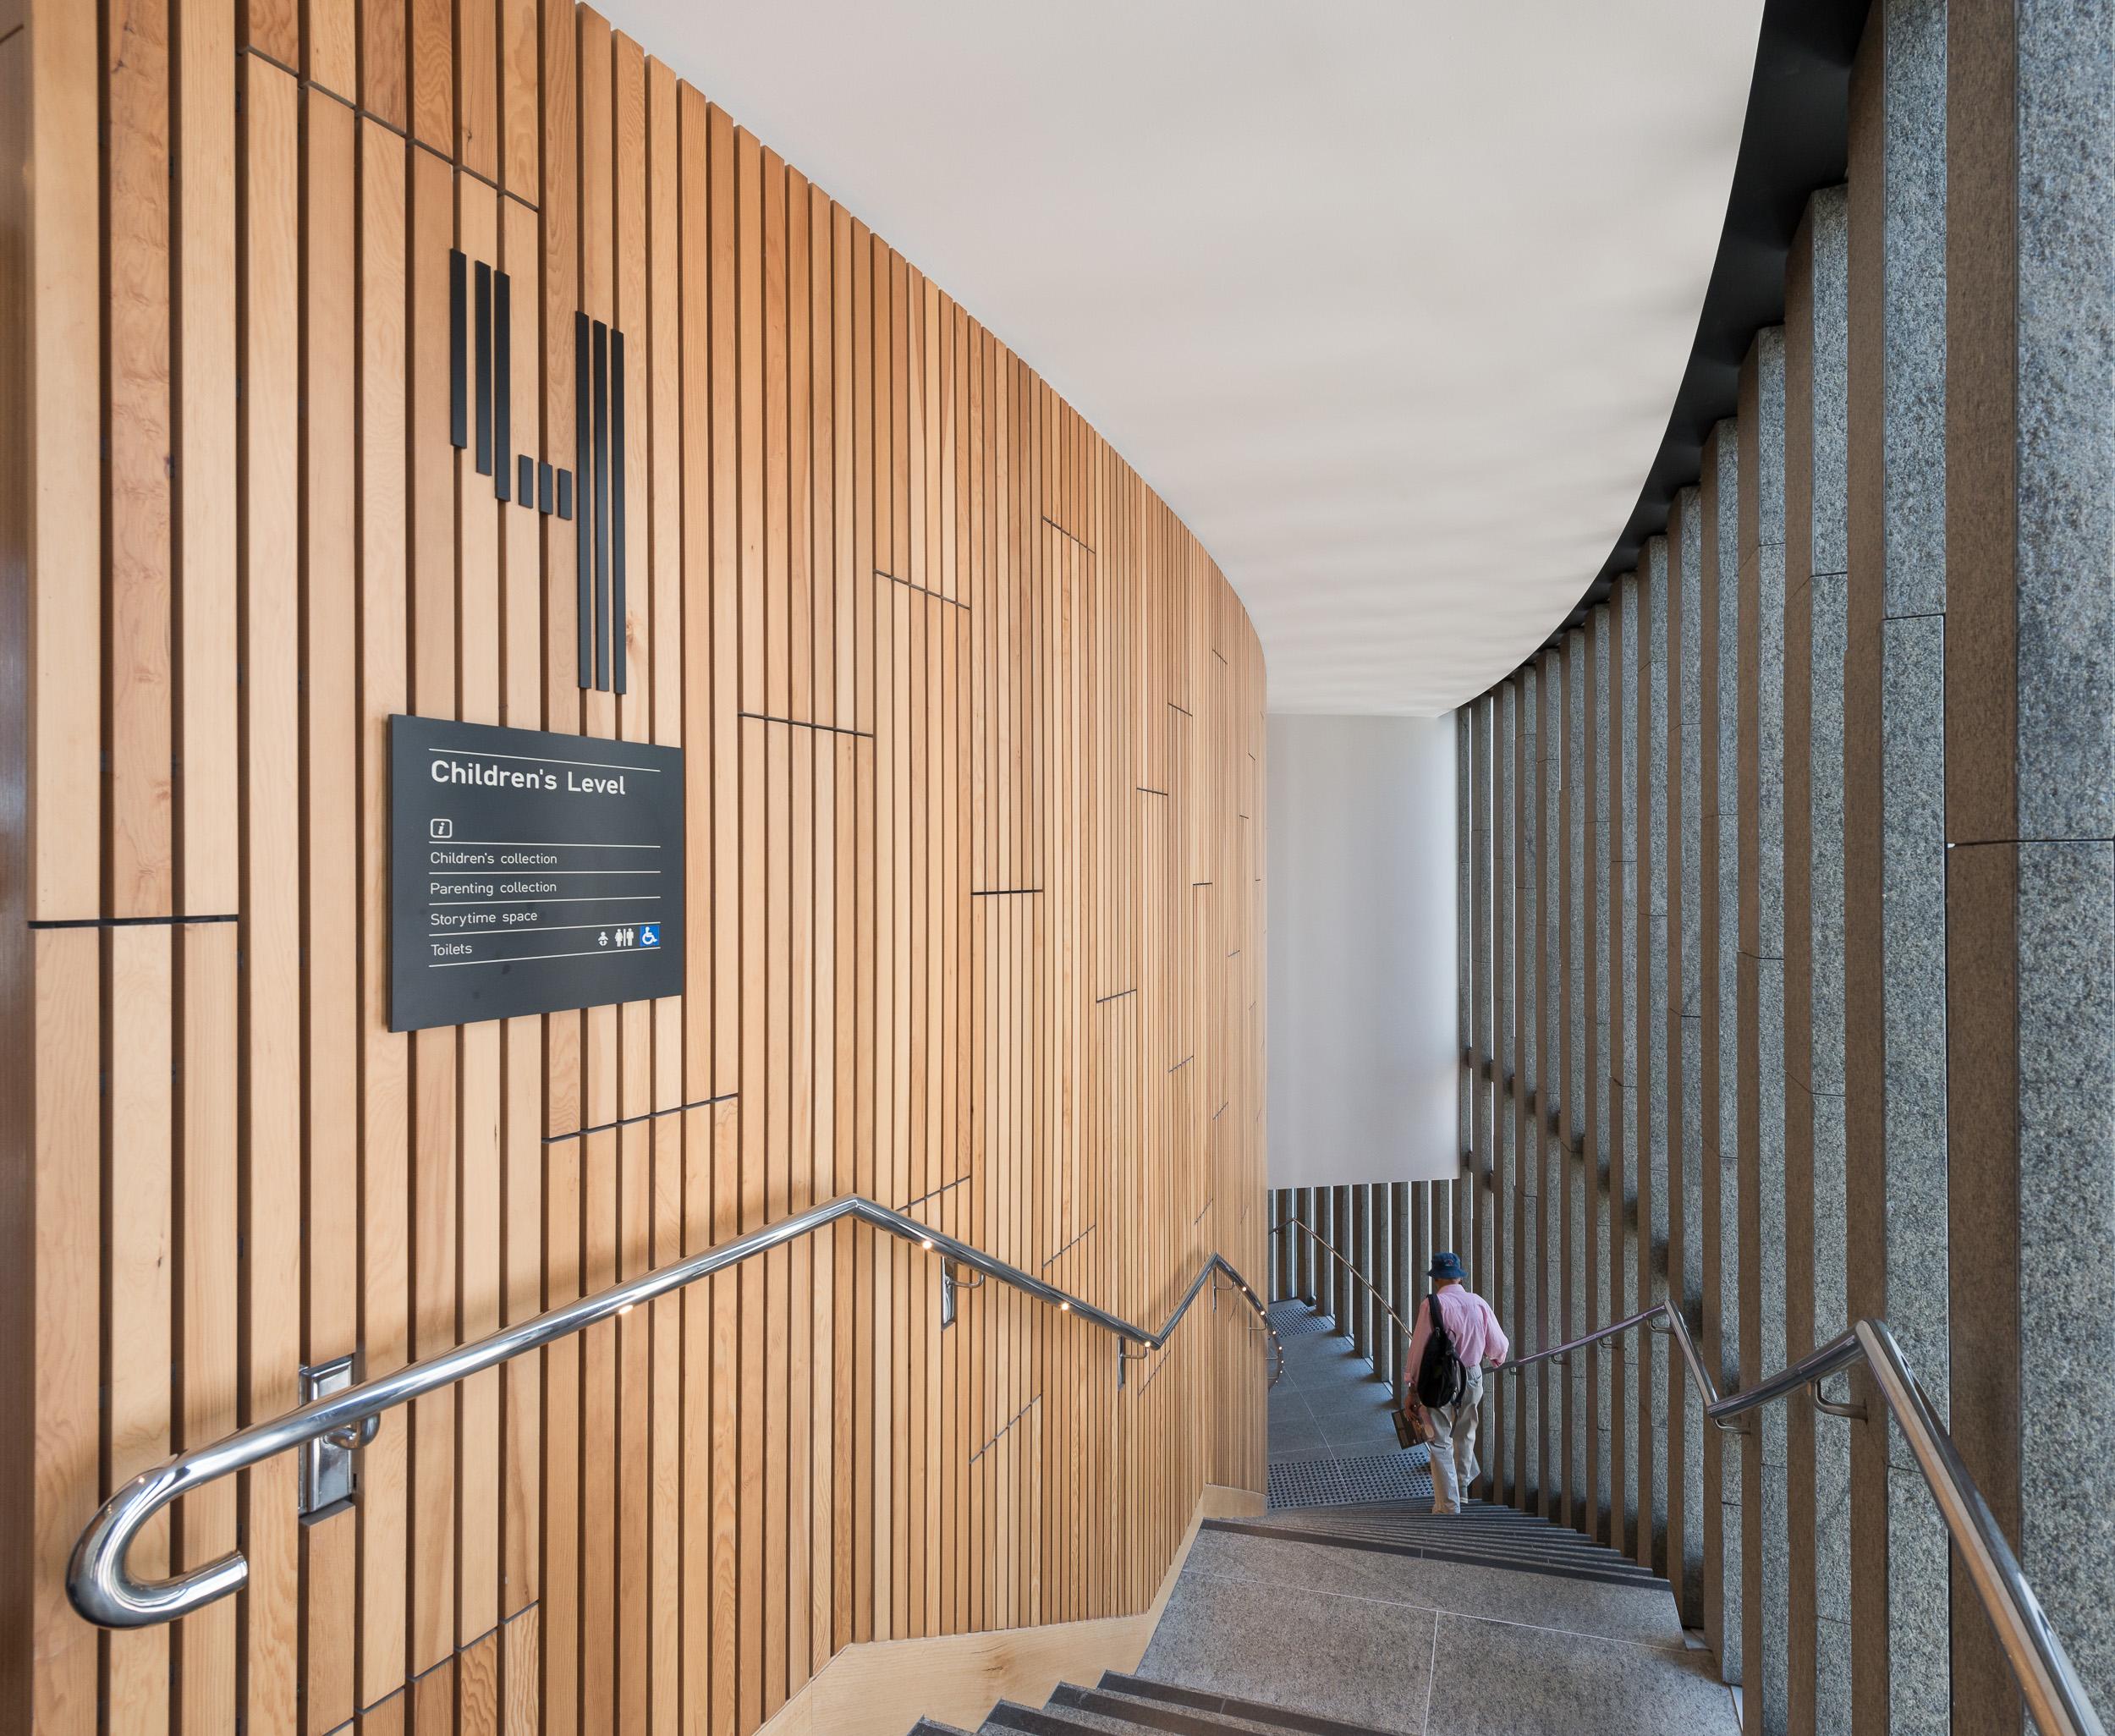 0001 - City of Perth Library - _JHG5727.jpg